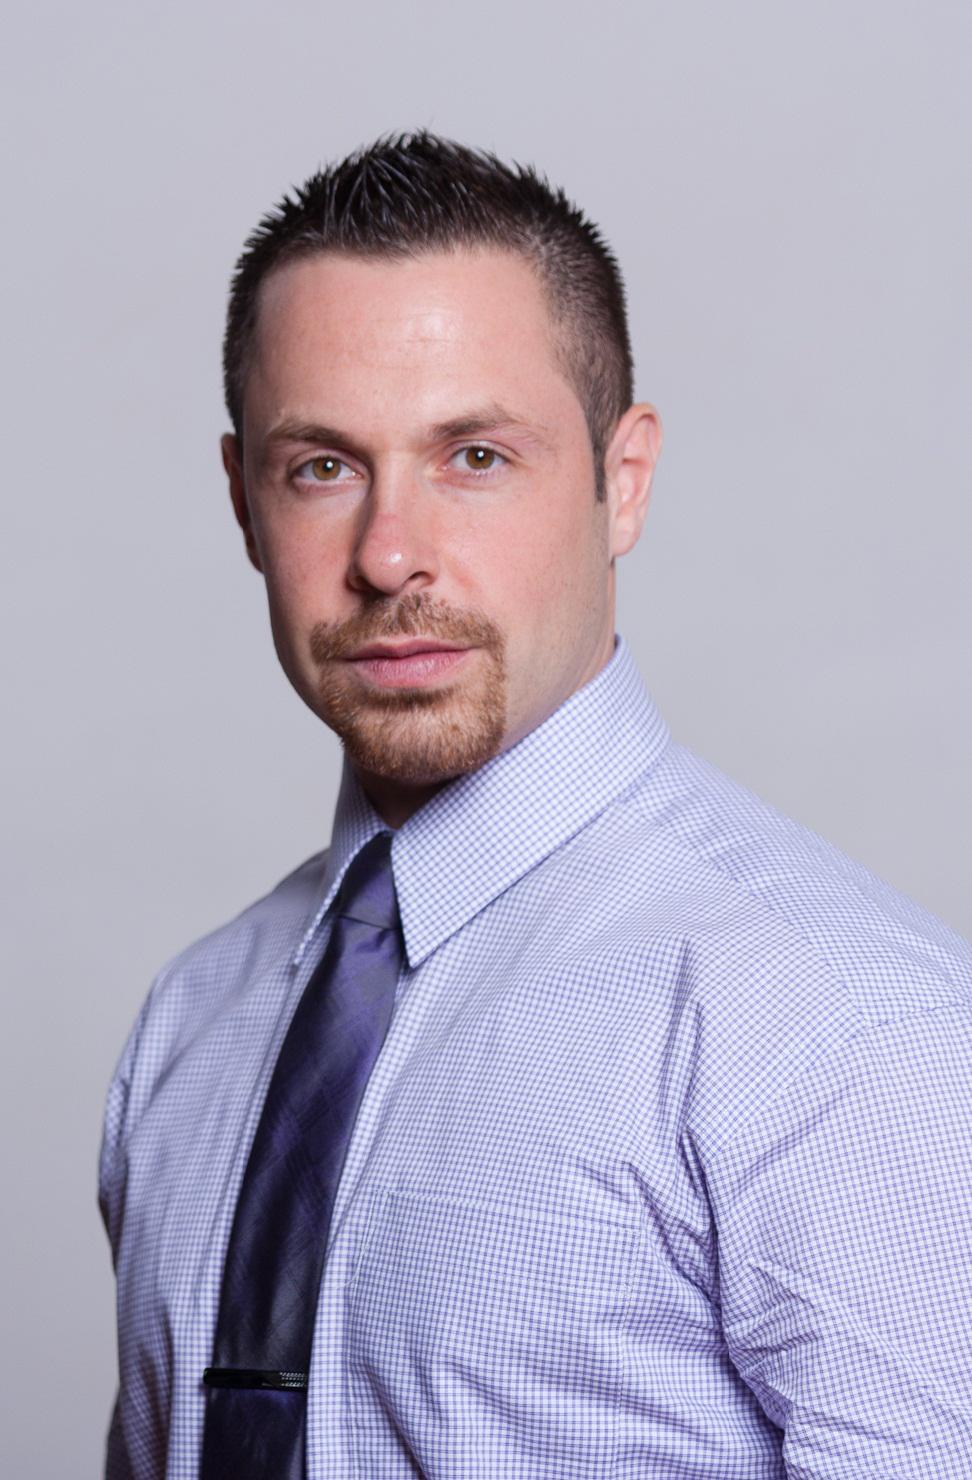 Joe Cicciarella